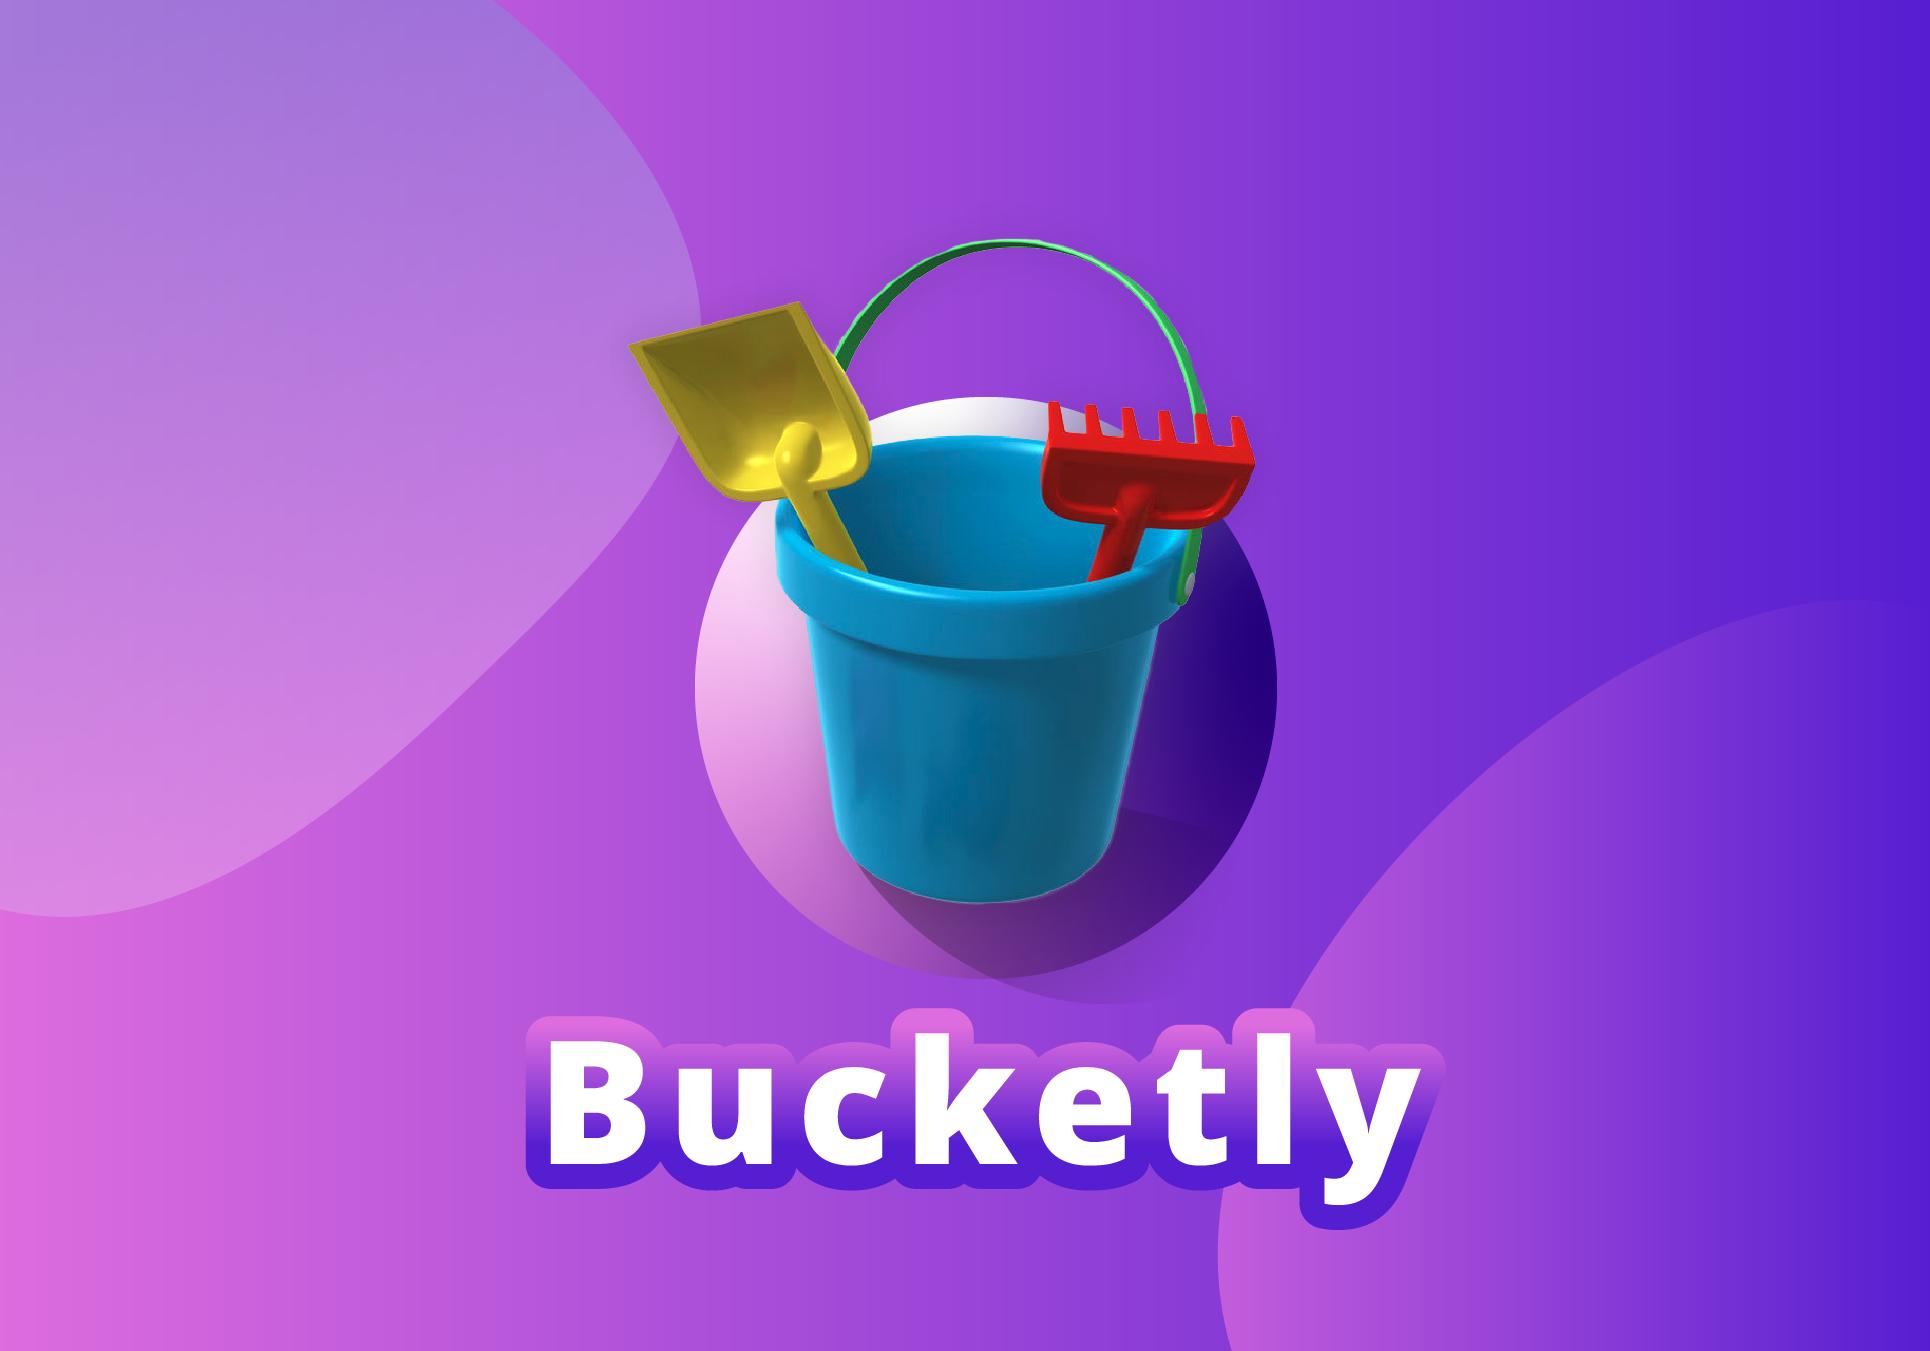 Bucketly showcase